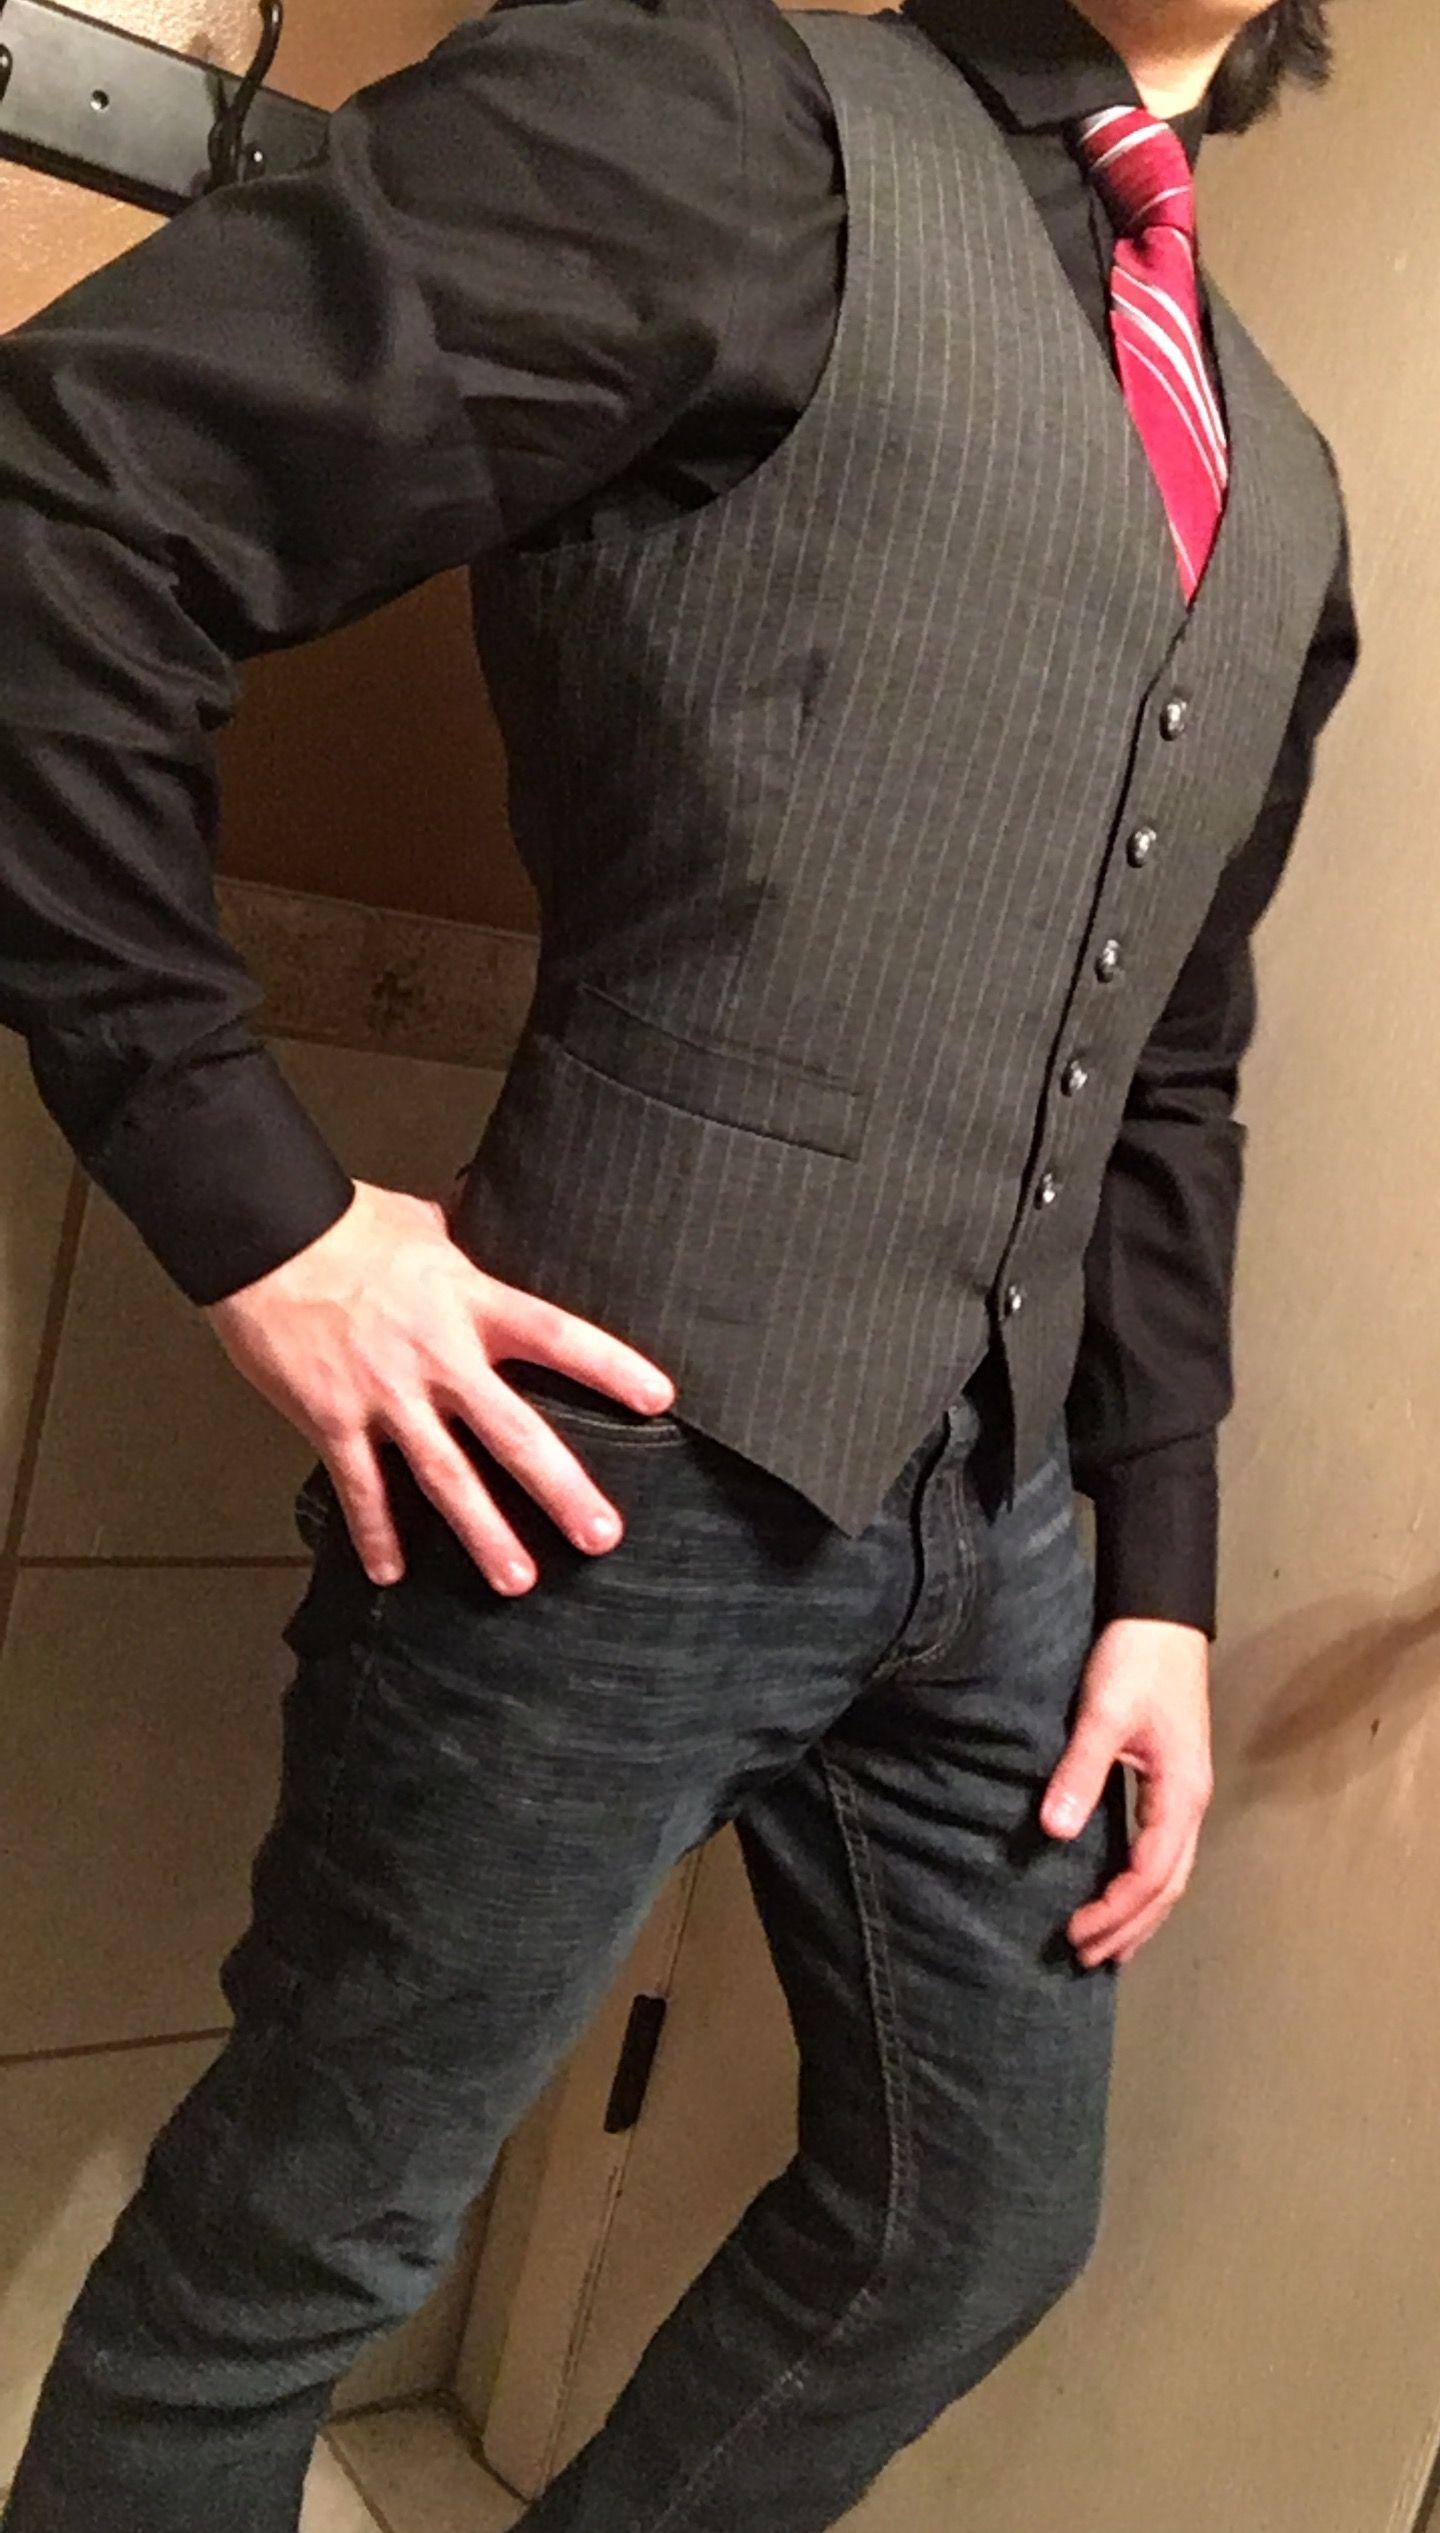 Men S Fashion Dark Gray Vest Red Tie Dark Blue Jeans And Black Dress Shirt Shirt Outfit Men Jeans Outfit Men Black Shirt Outfits [ 2533 x 1440 Pixel ]